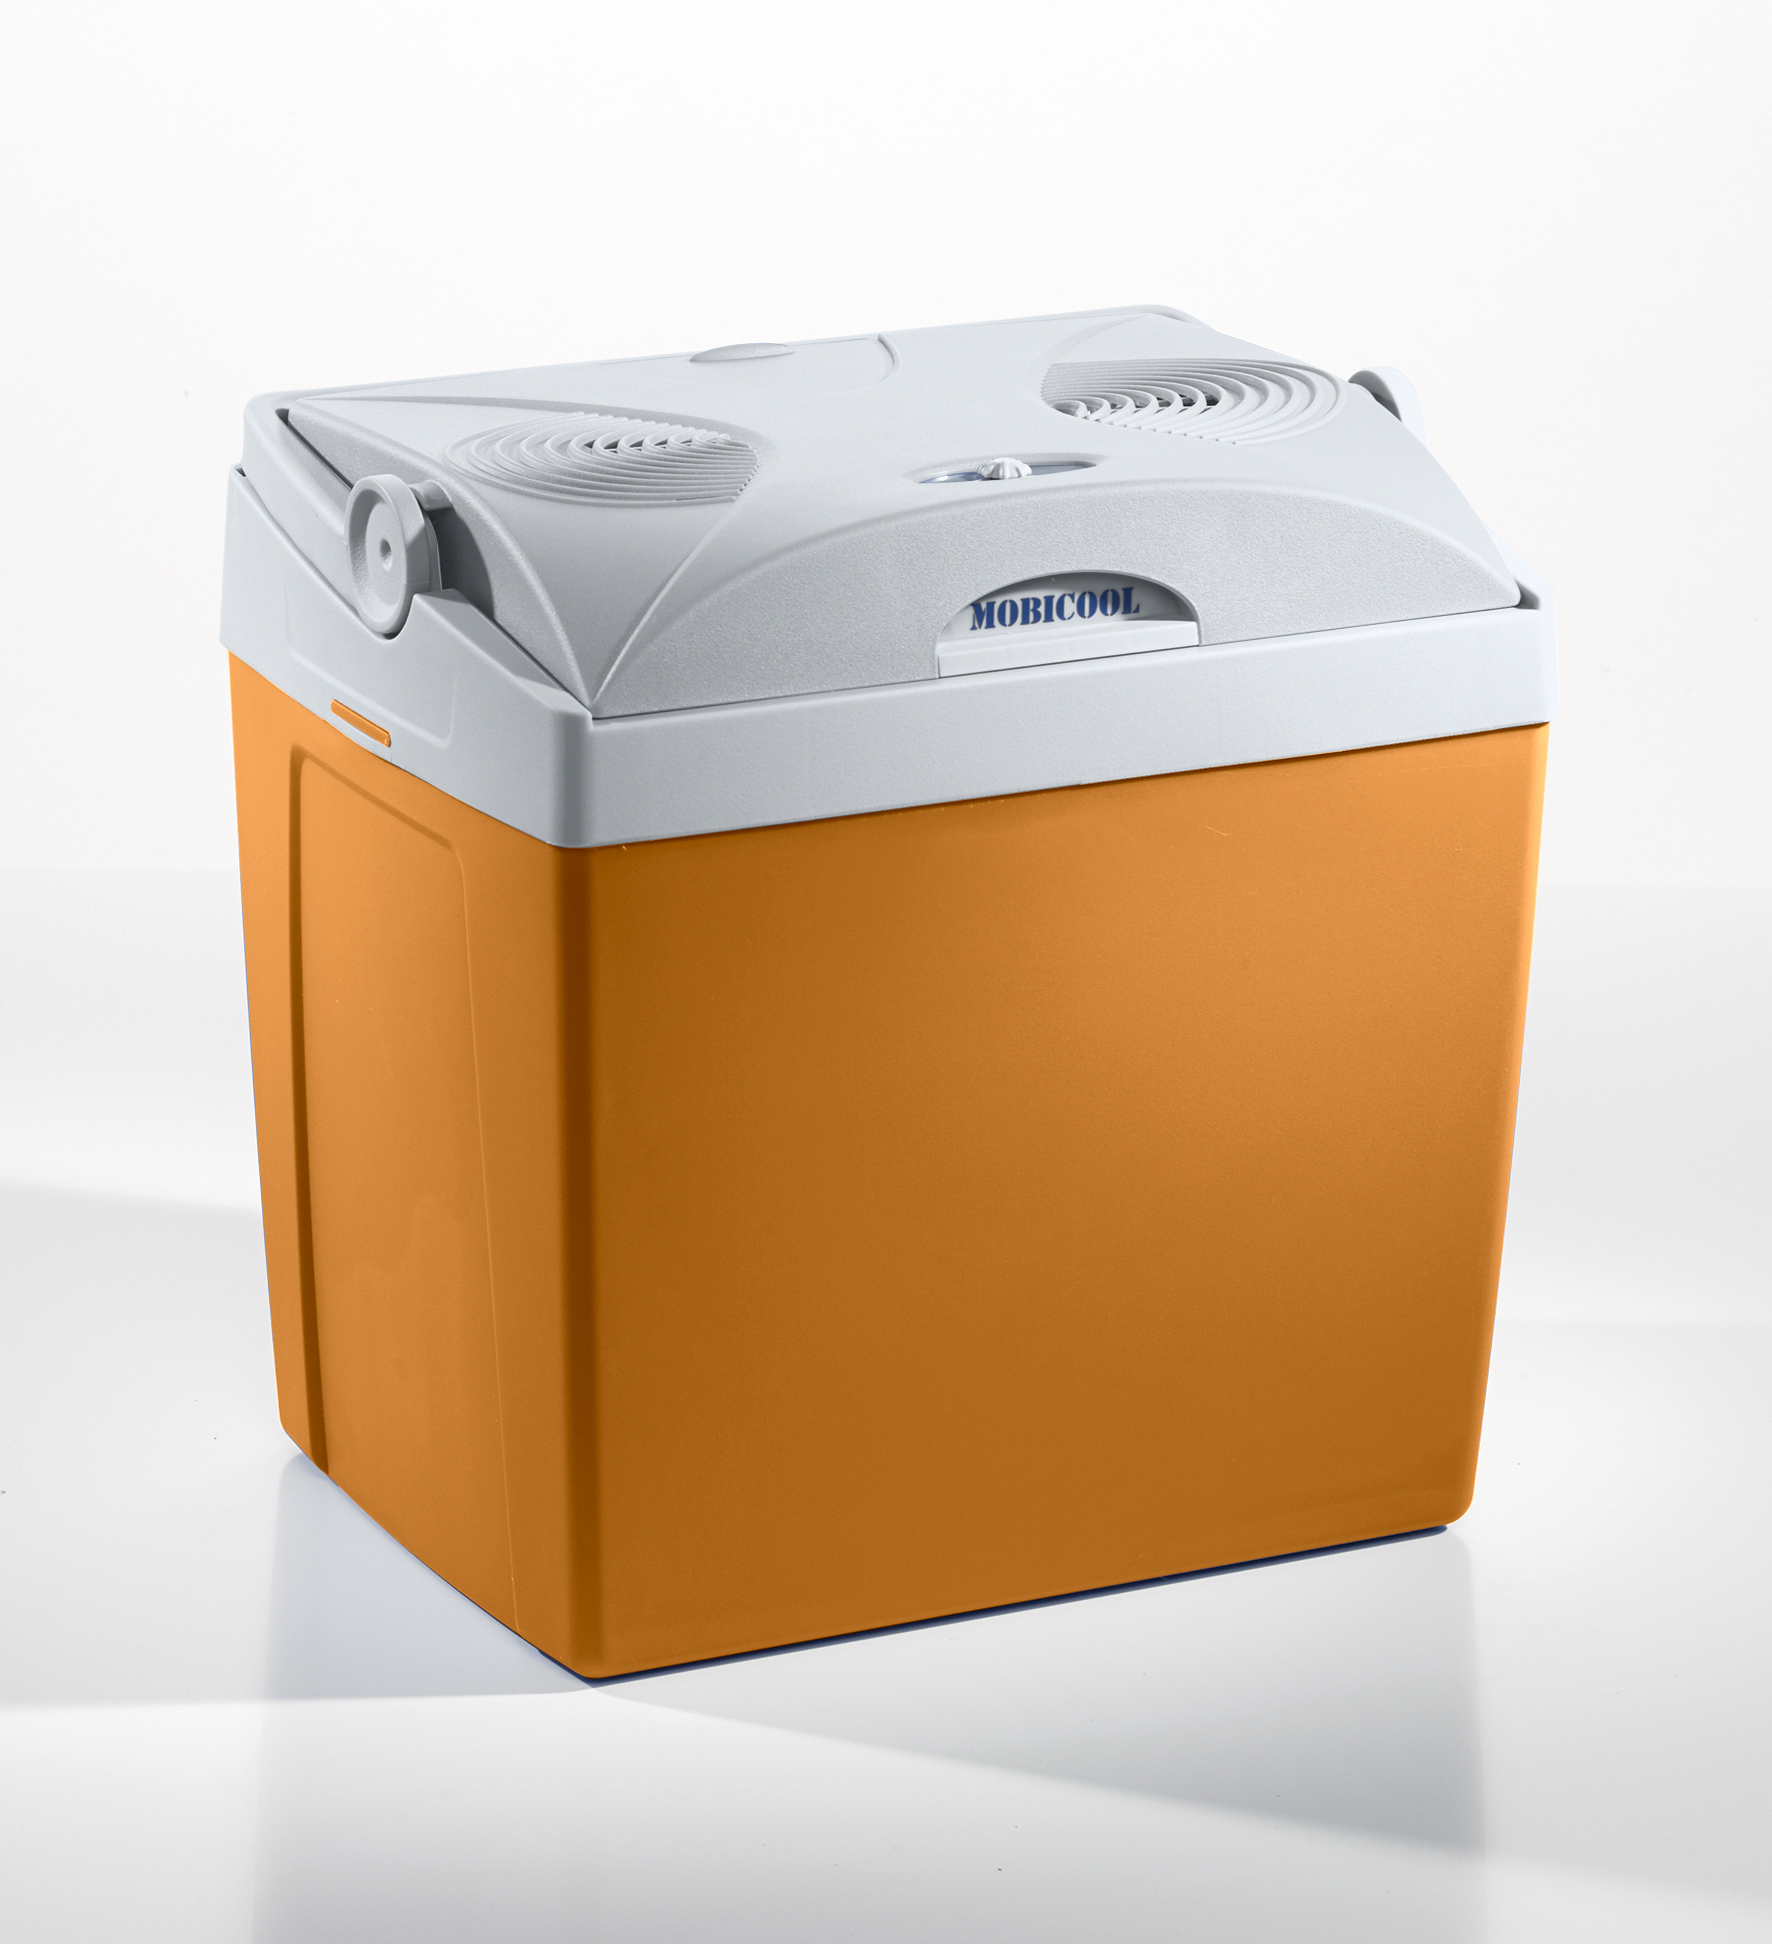 25 l mobicool v26 elektrische kühlbox 12/230 v .. - dometic werksverkauf